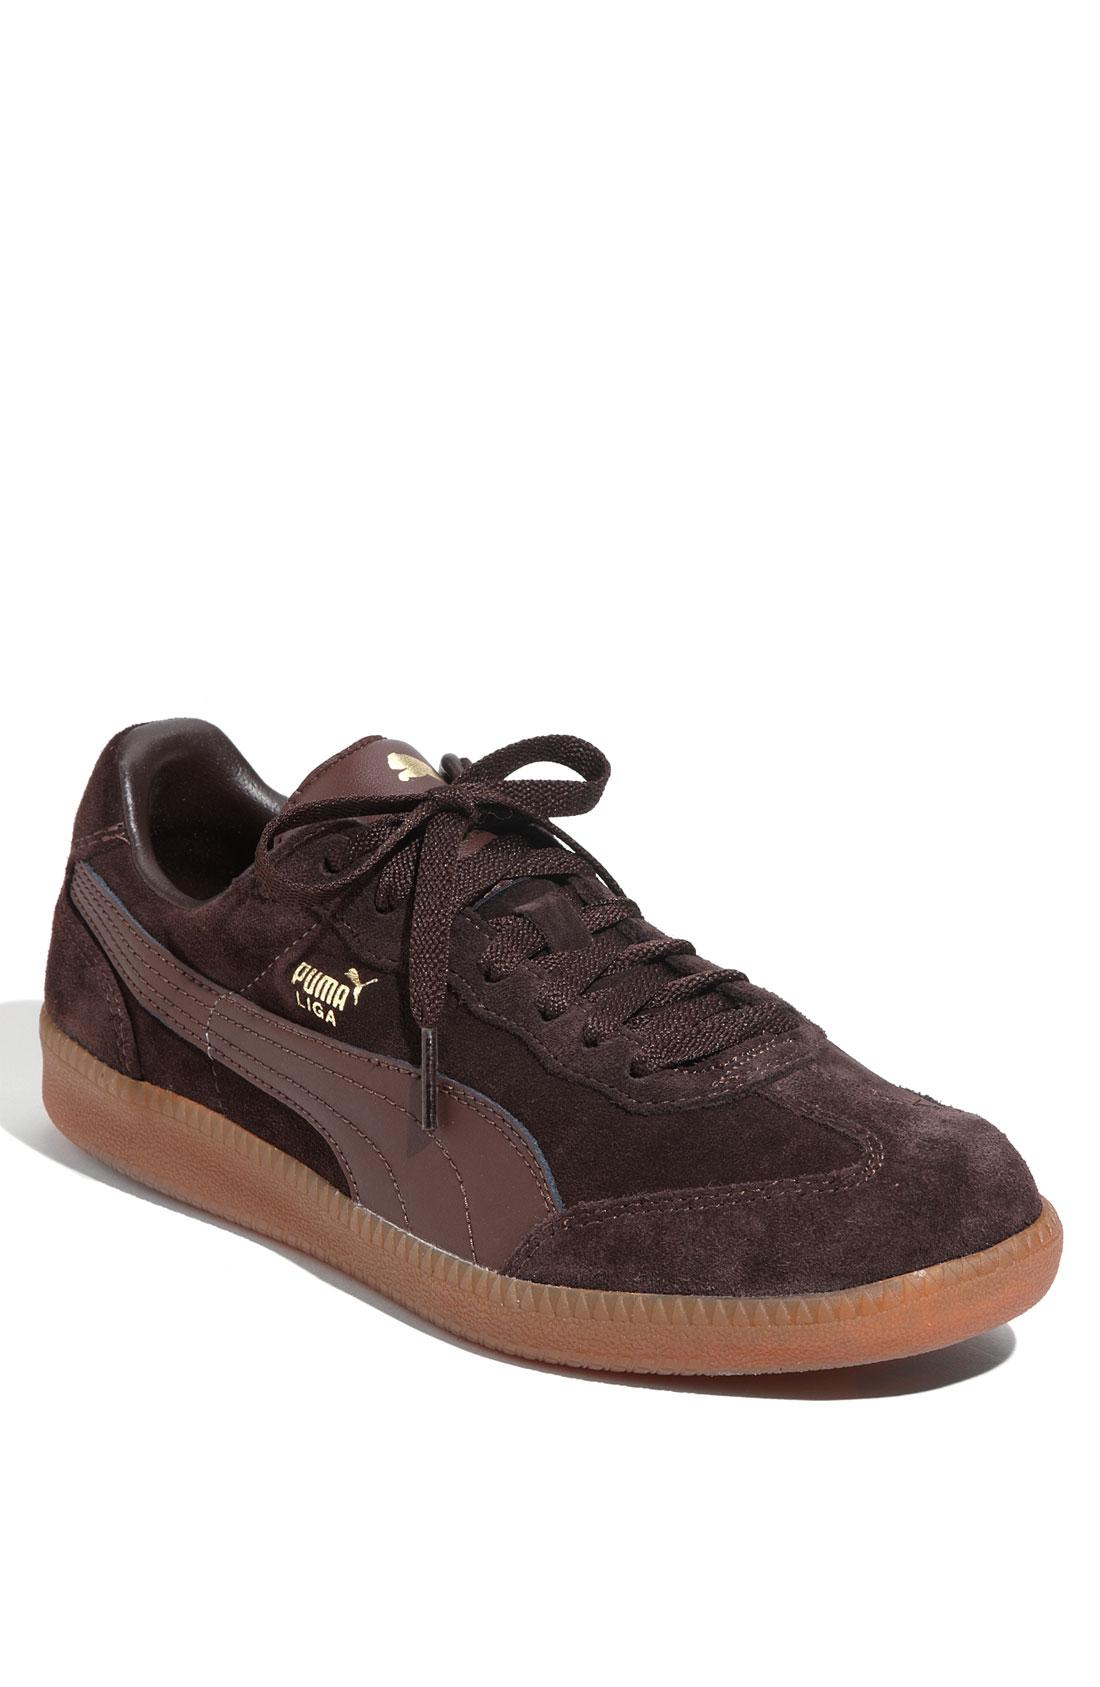 puma liga suede ii sneaker in brown for men lyst. Black Bedroom Furniture Sets. Home Design Ideas